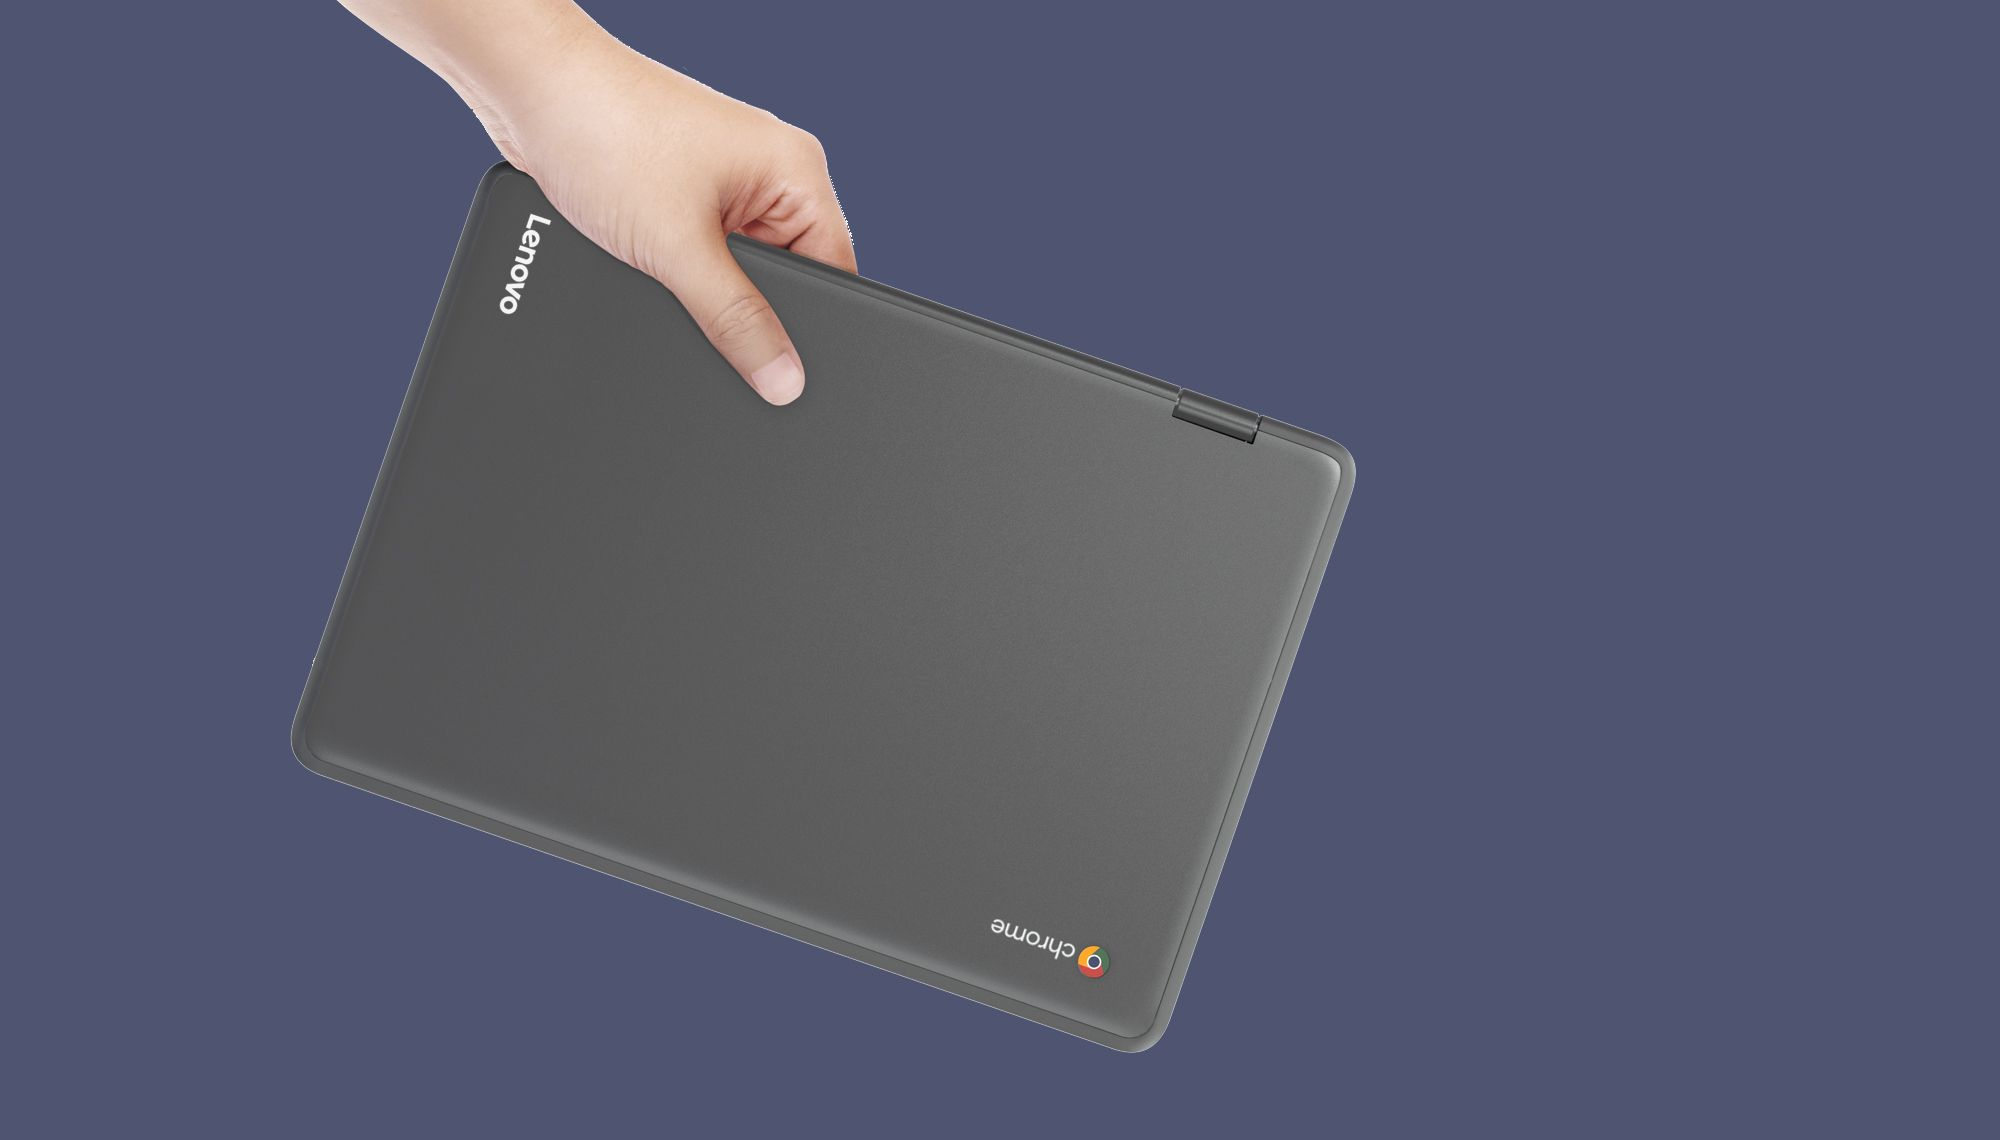 Lenovo's Flex 11 Chromebook isn't just for the classroom